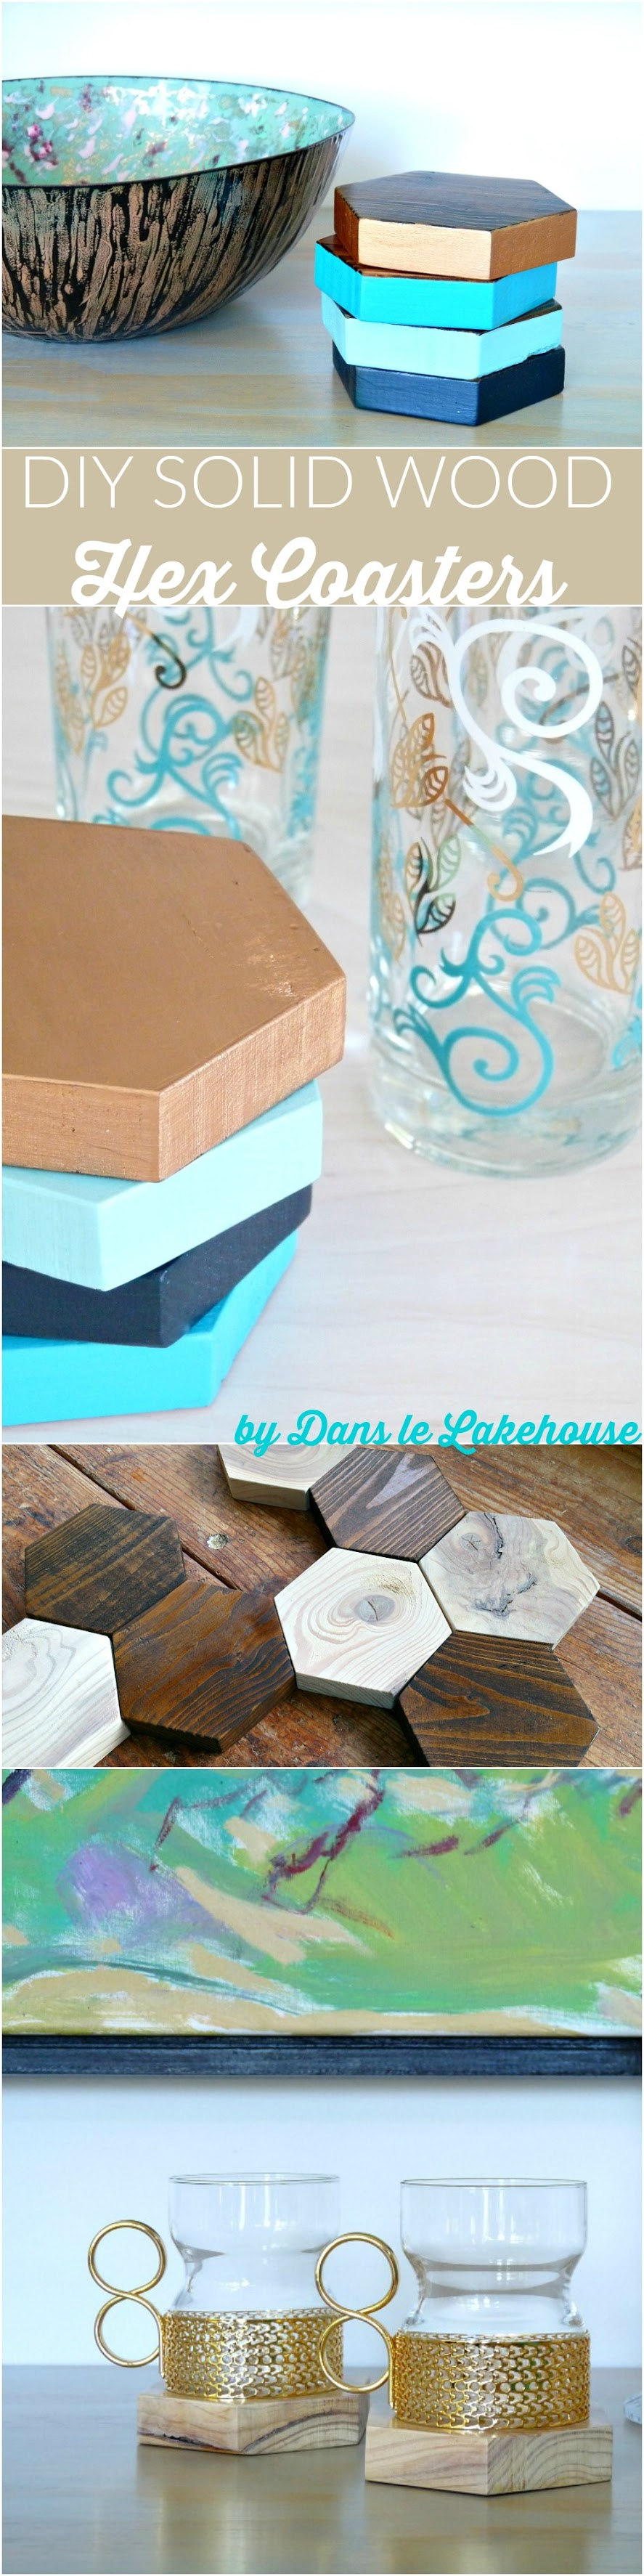 DIY Solid Wood Hex Coaster - Two Ways